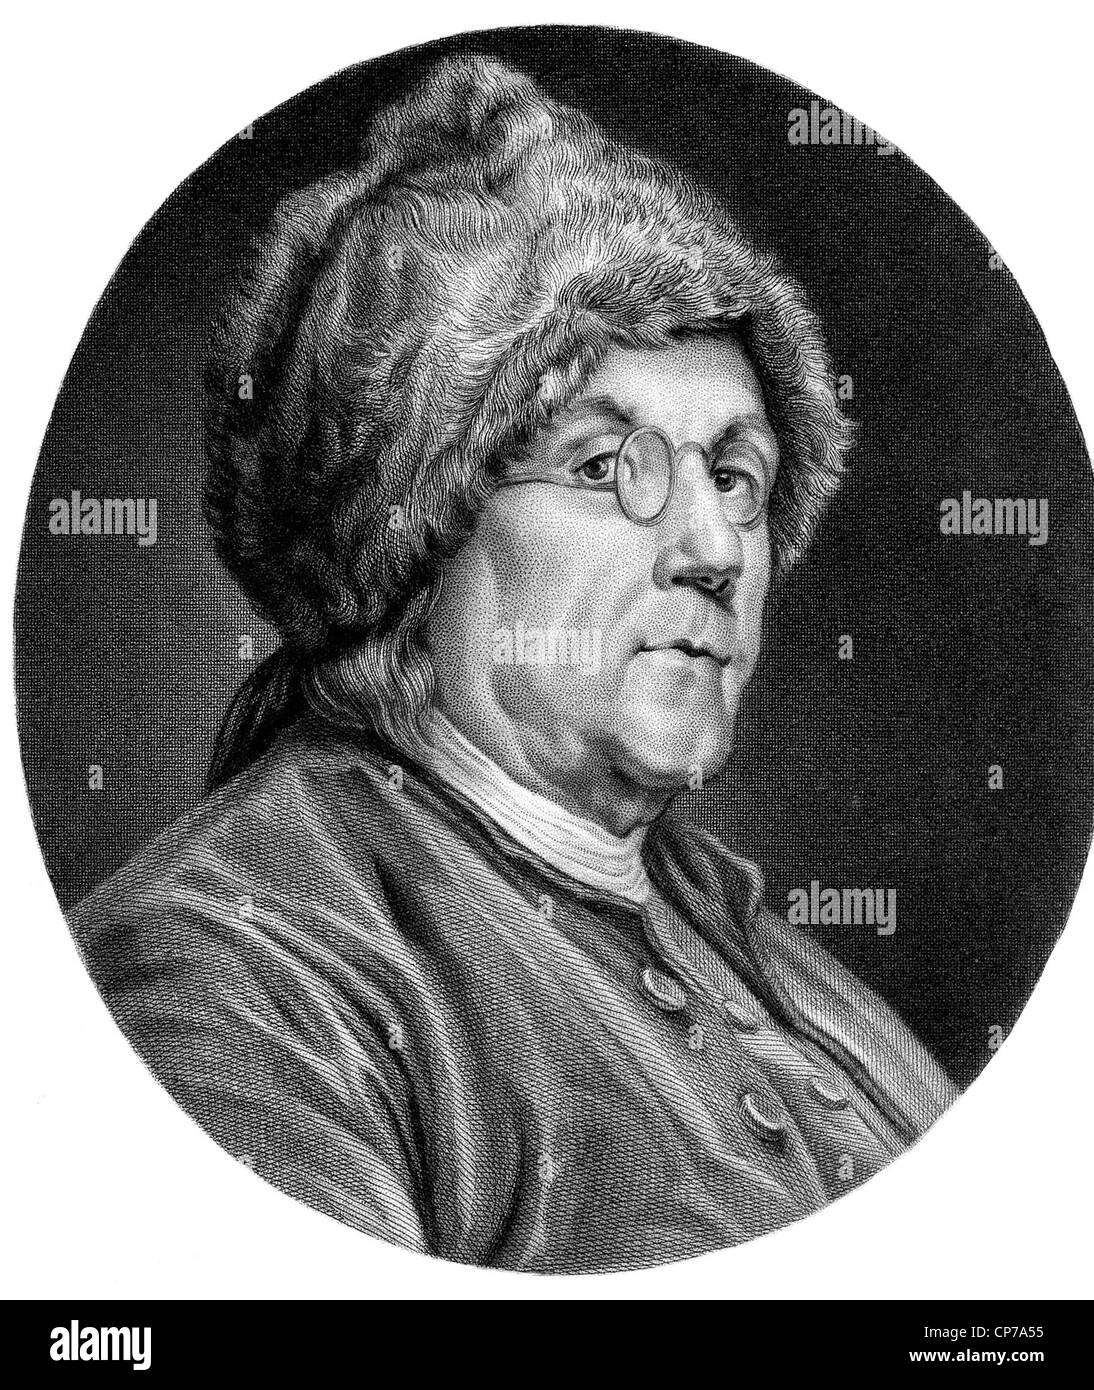 Portrait Of American Founding Father Benjamin Franklin In